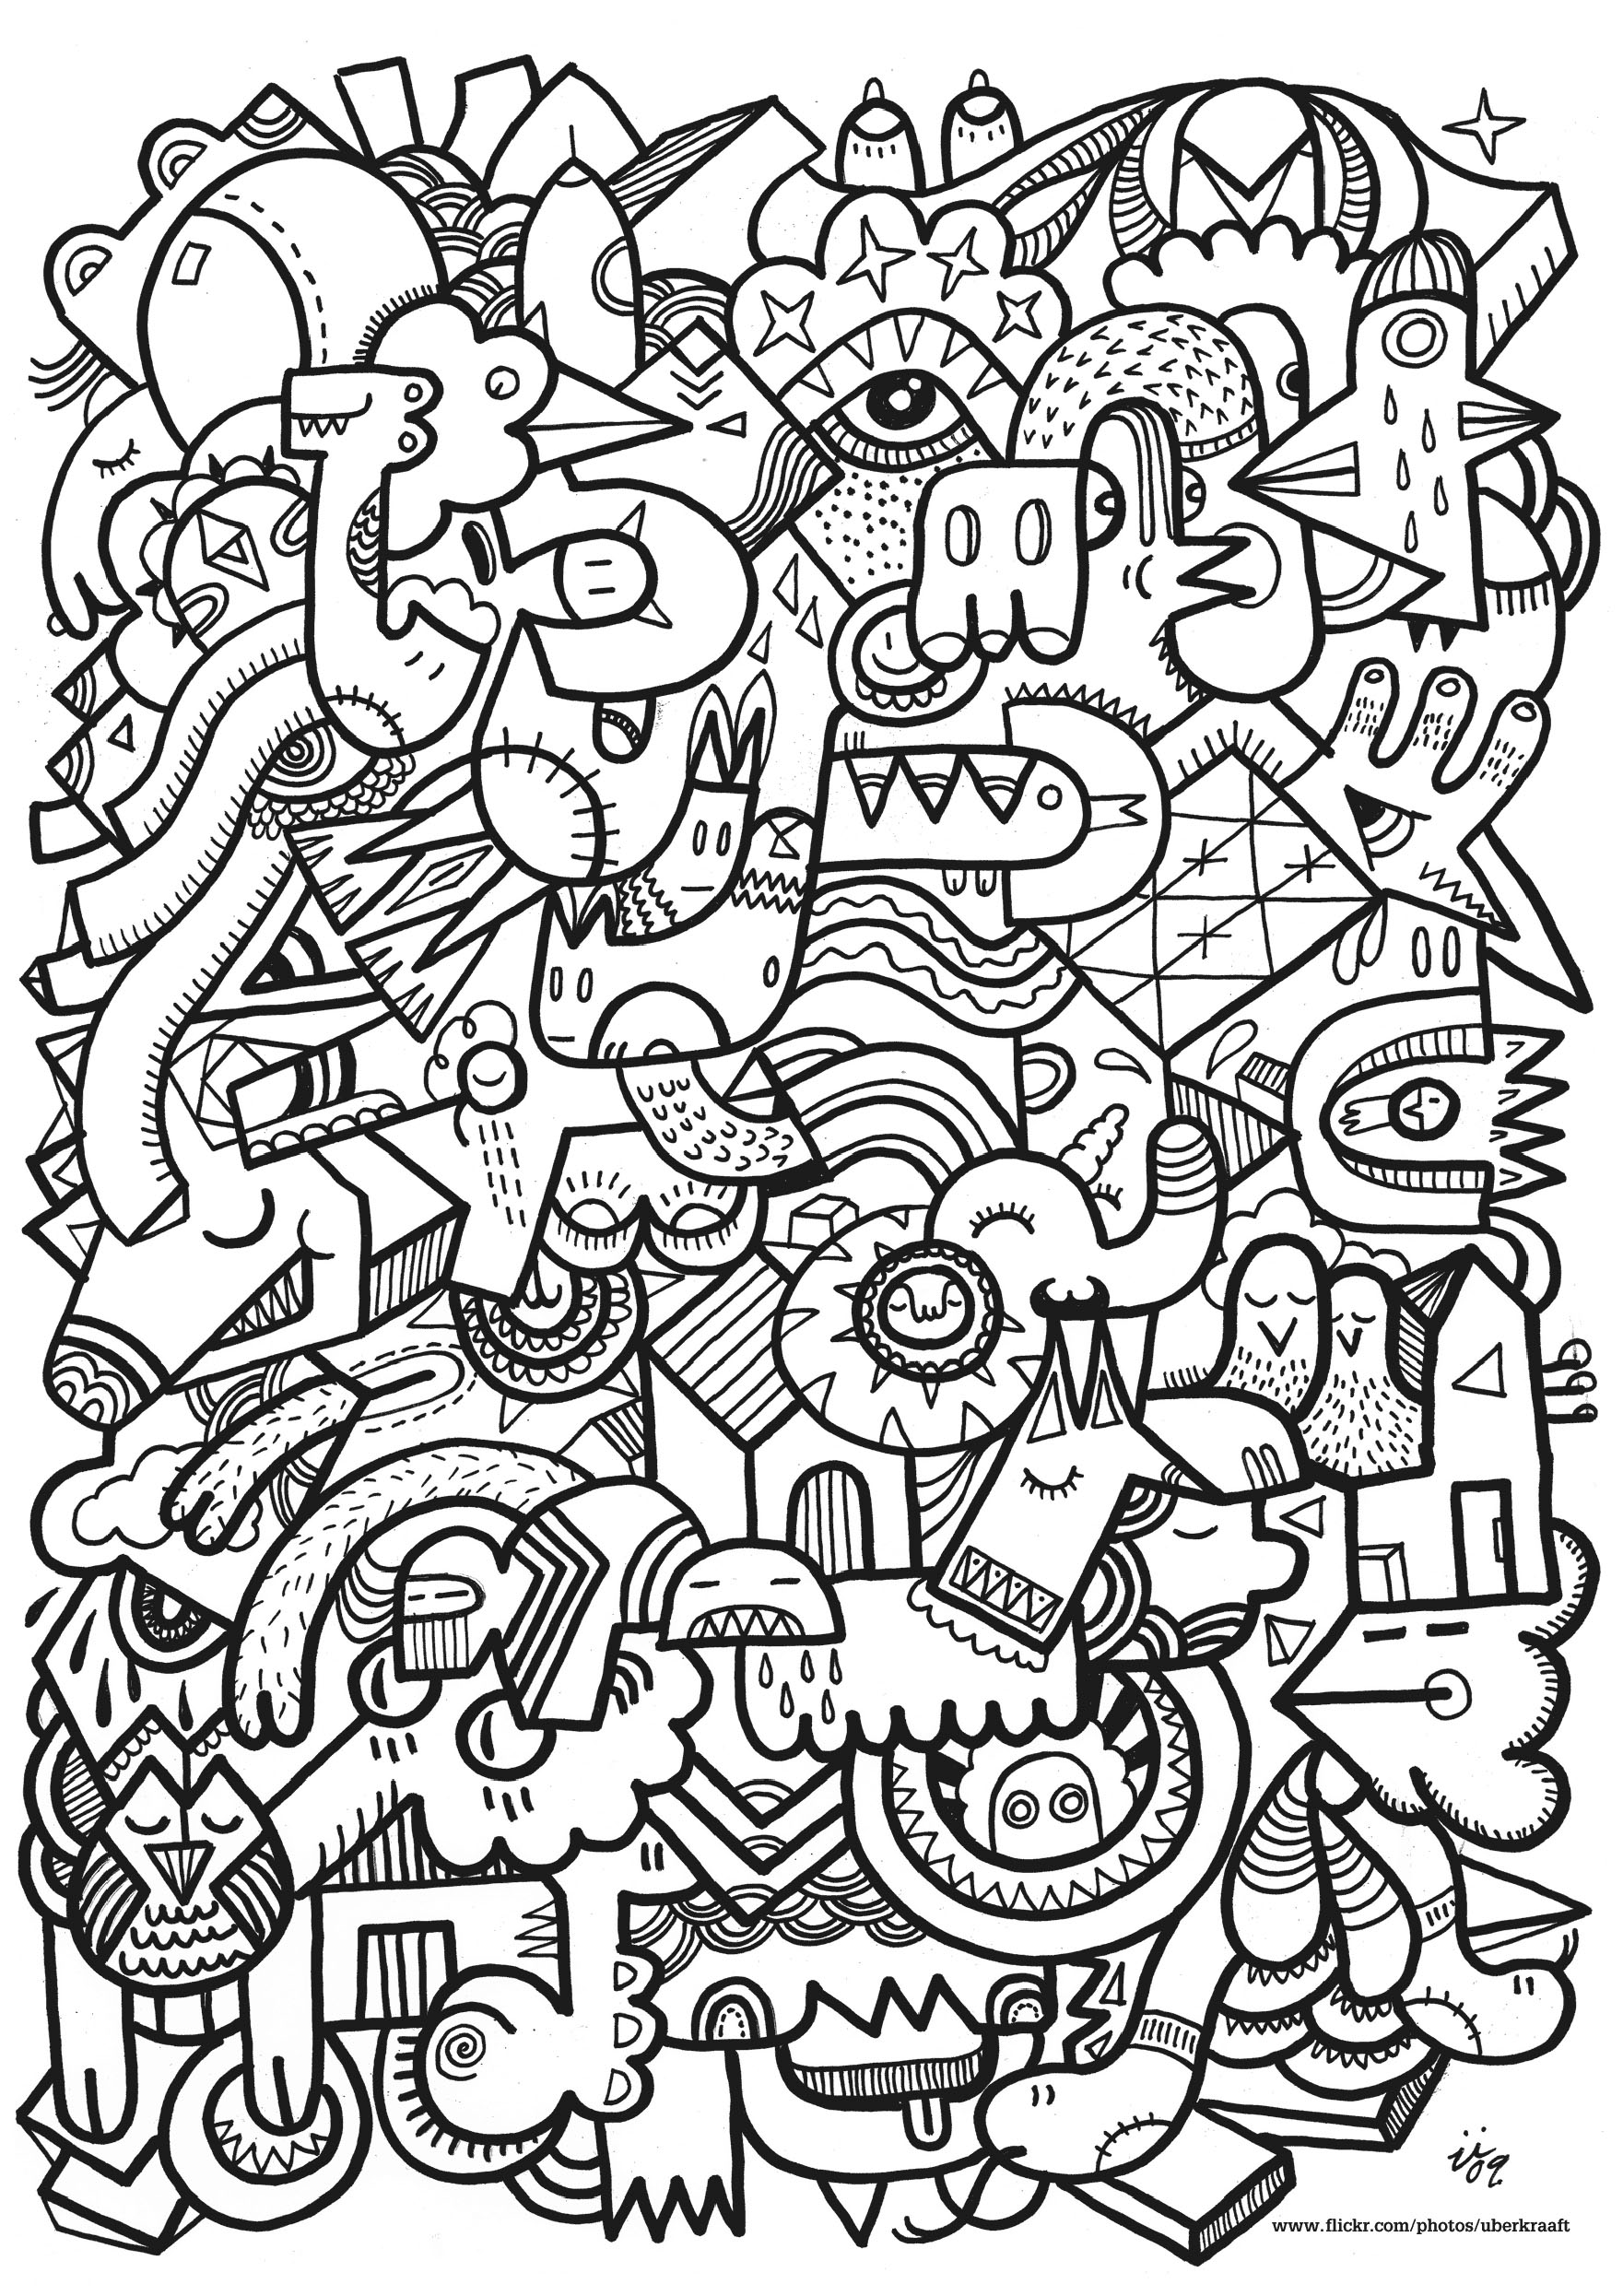 Disegni da colorare per adulti : Doodle art / Doodling - 12